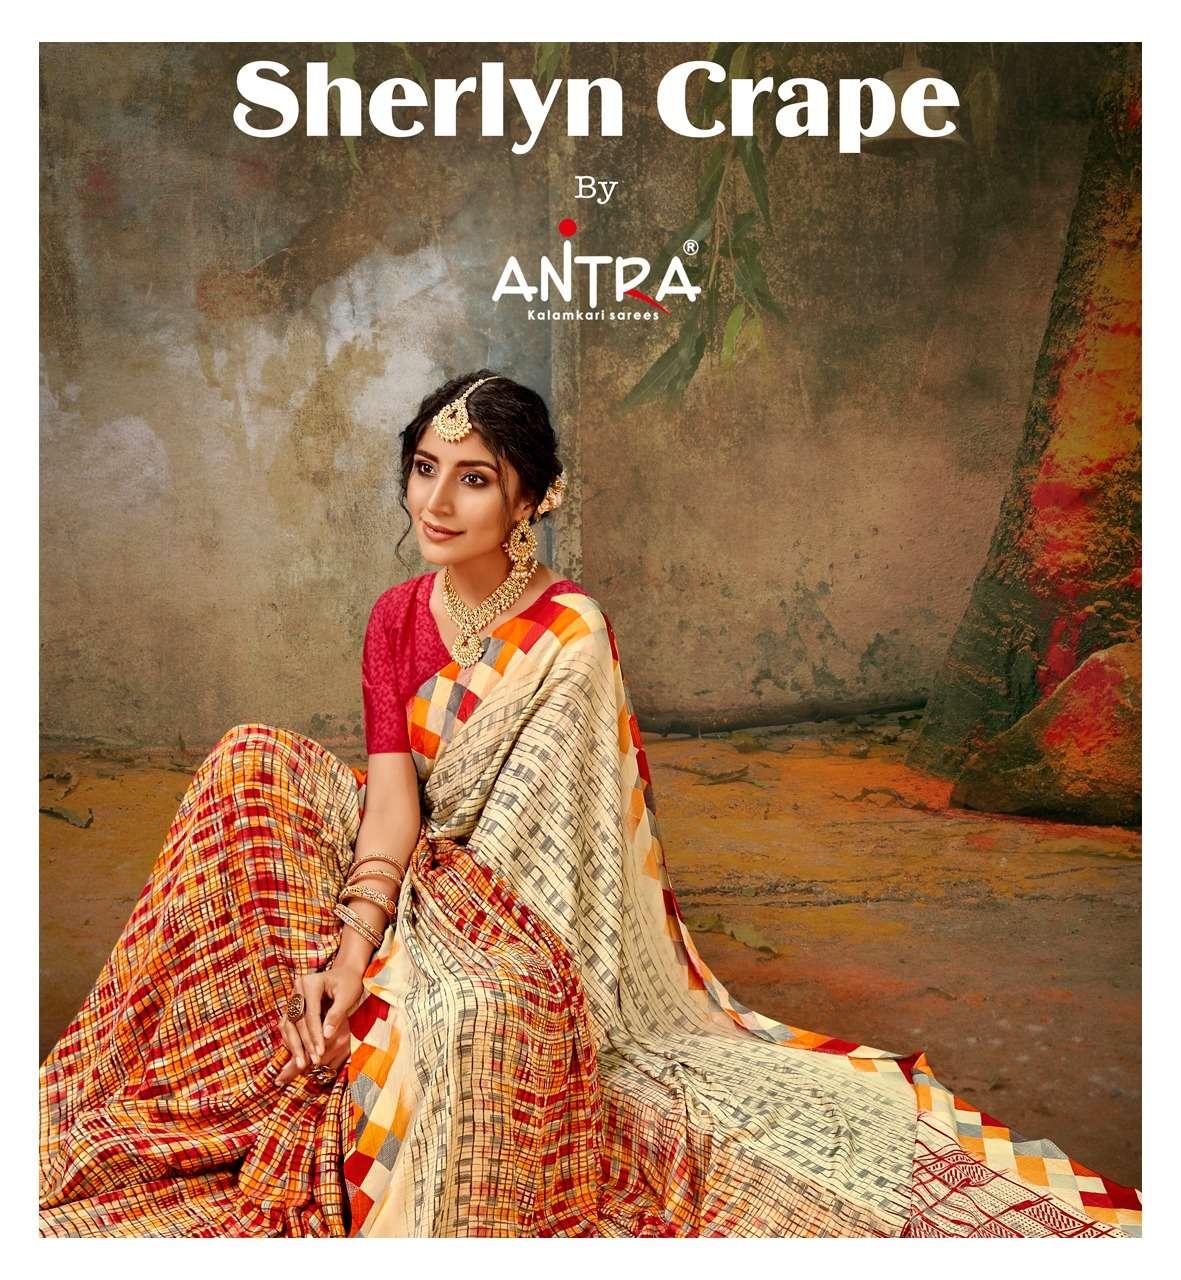 Antra Sherlyn Crape Printed Crape Saree New Catalog In Wholesale Price